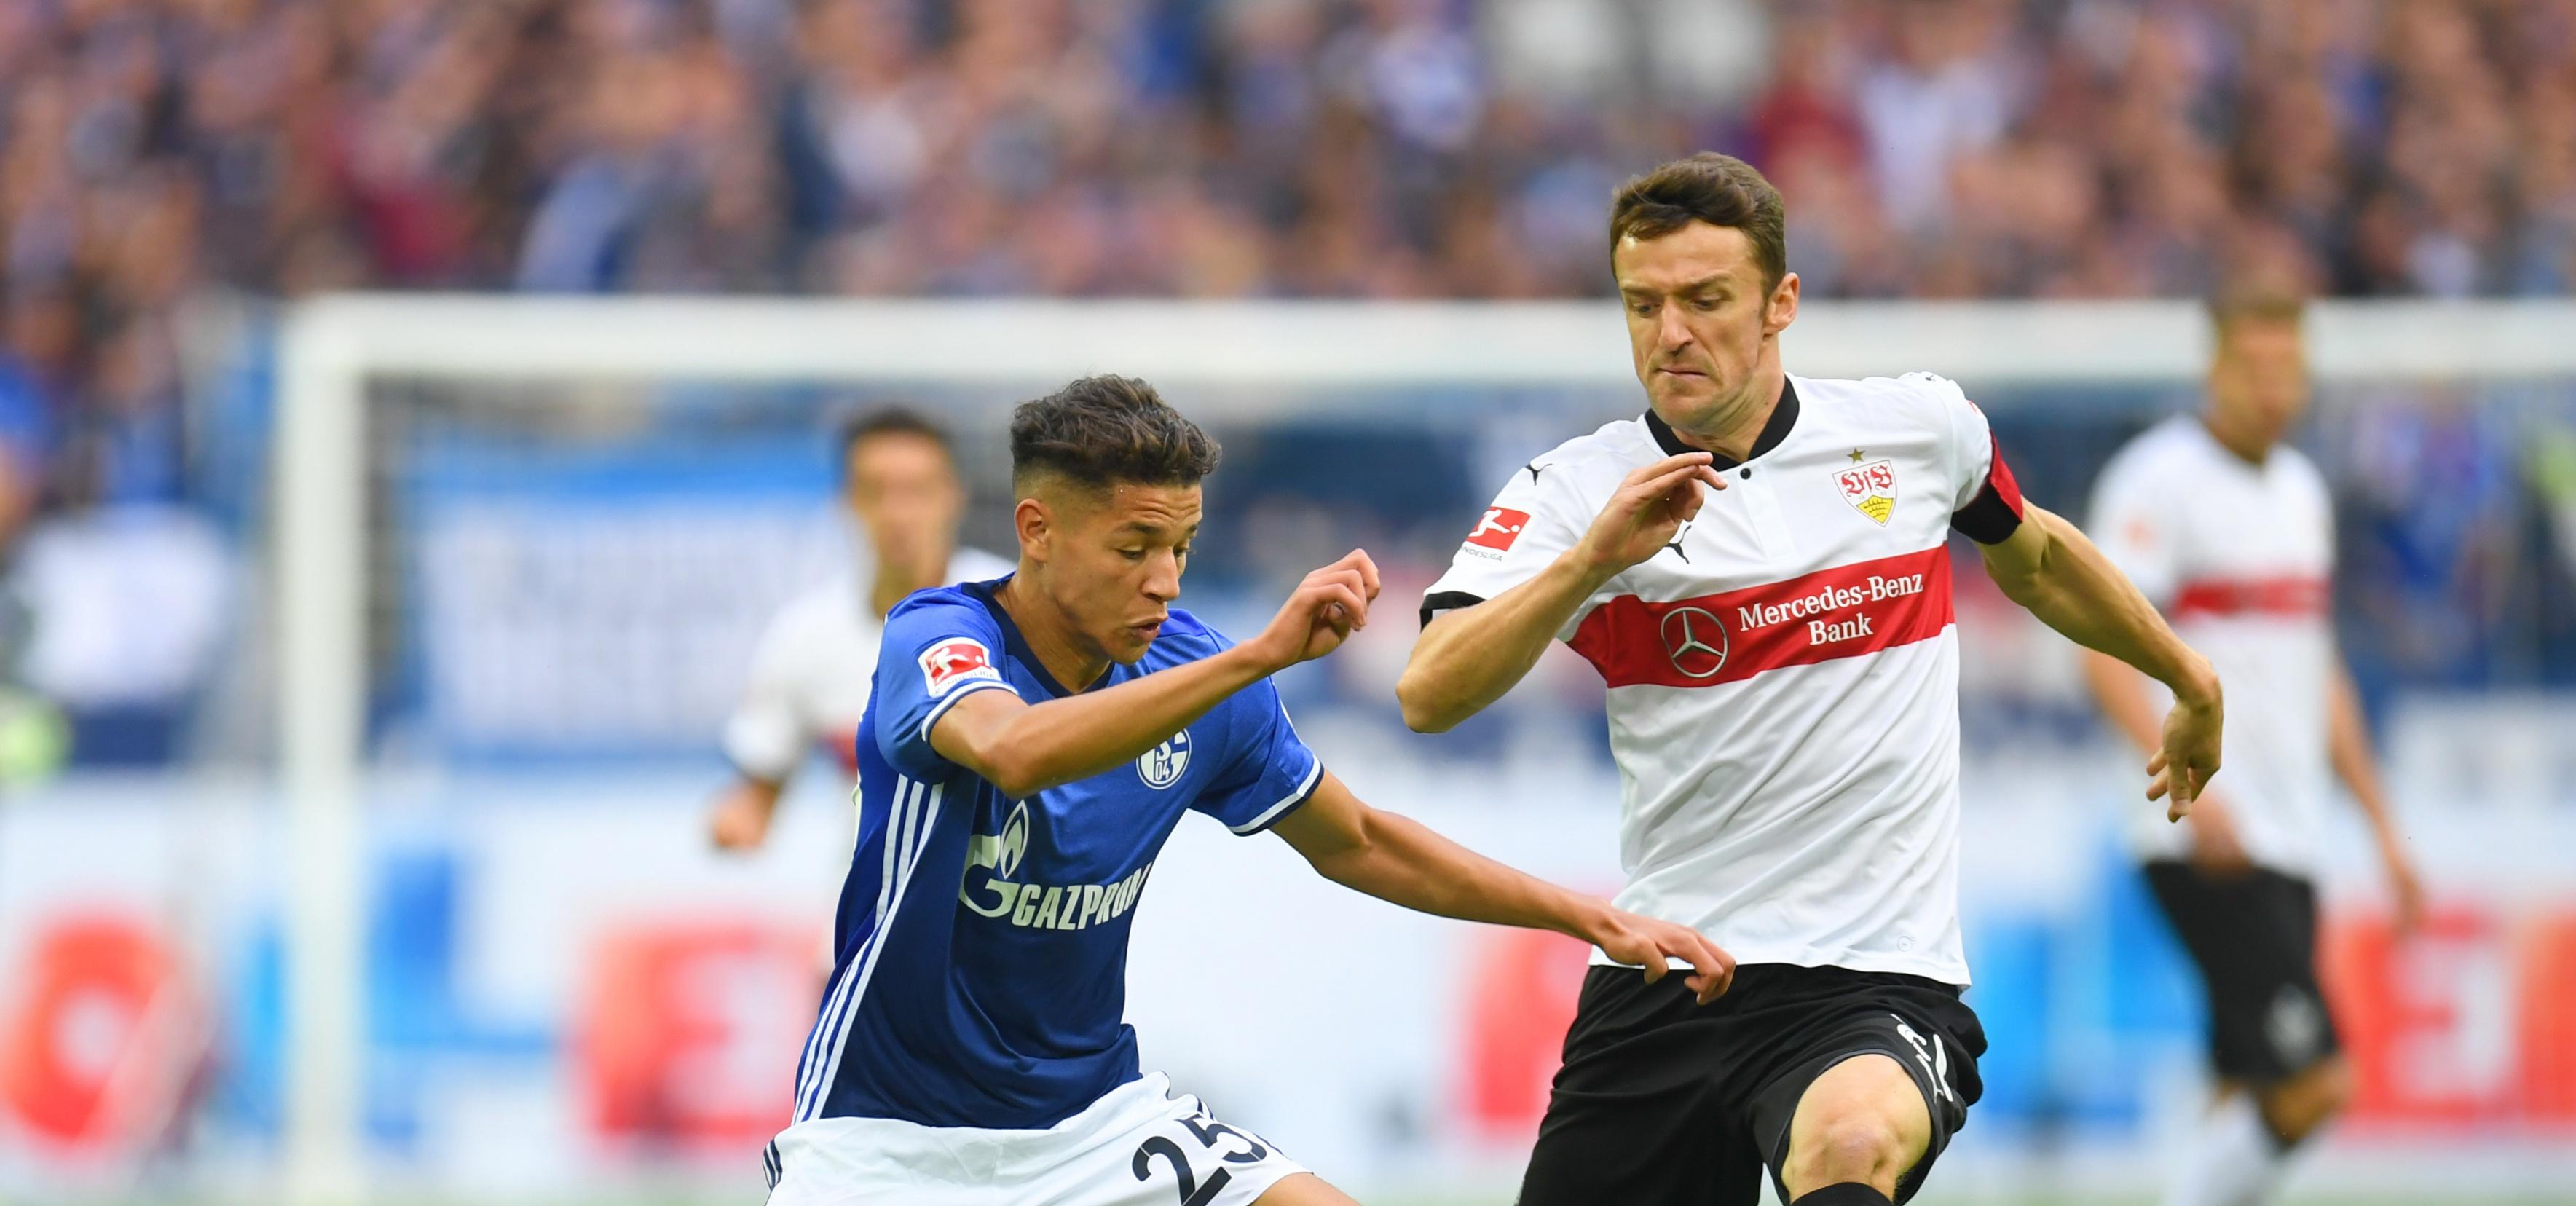 [Bundesliga] Amine Harit, le petit prince à la tunique bleu roi